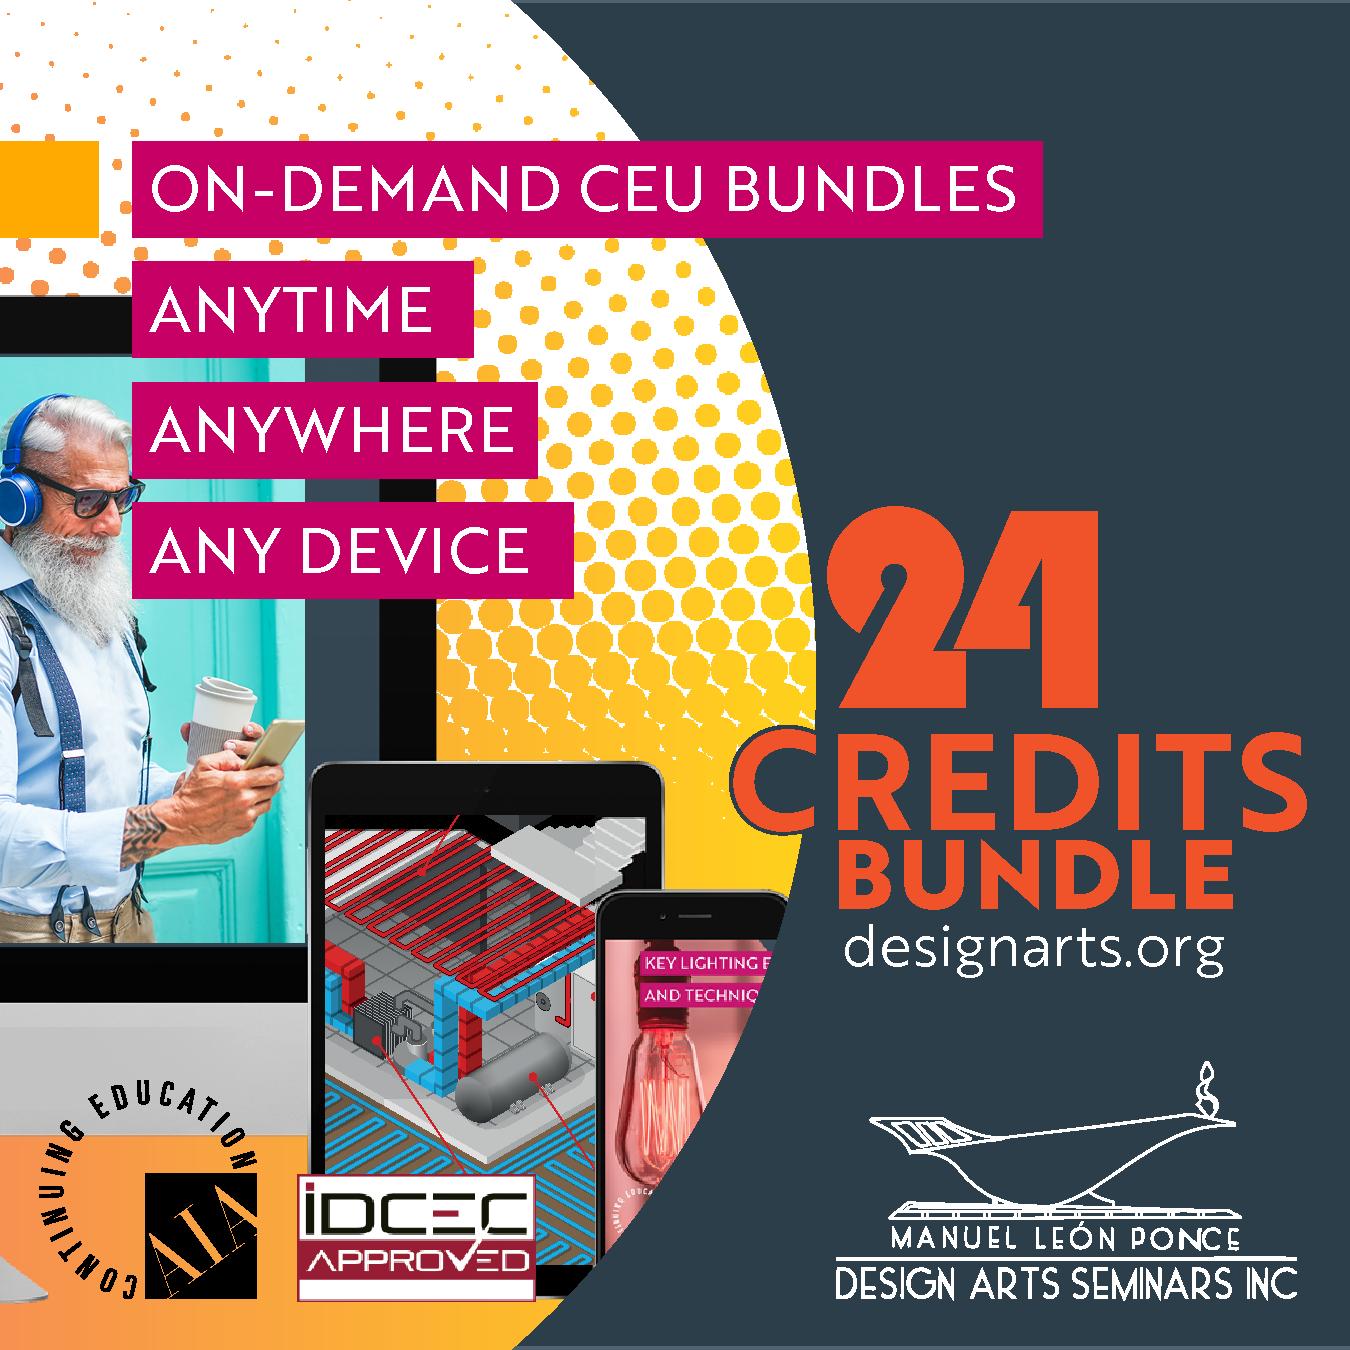 24-CREDIT ON-DEMAND WEBINAR BUNDLE